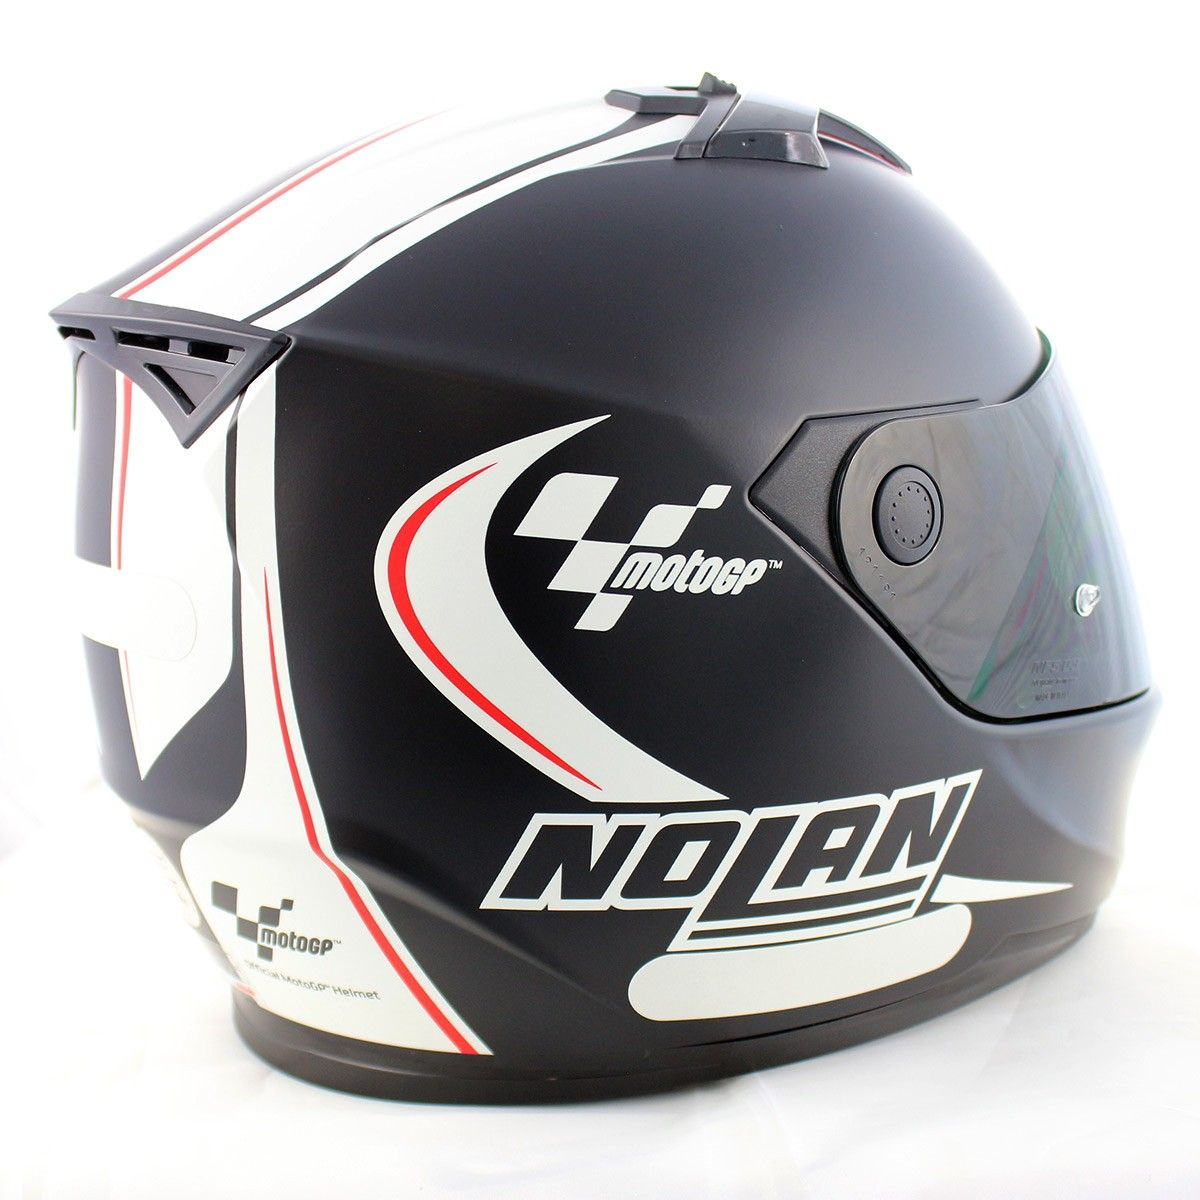 Capacete Nolan N64 MotoGP Flat Black c/ Branco   - Planet Bike Shop Moto Acessórios